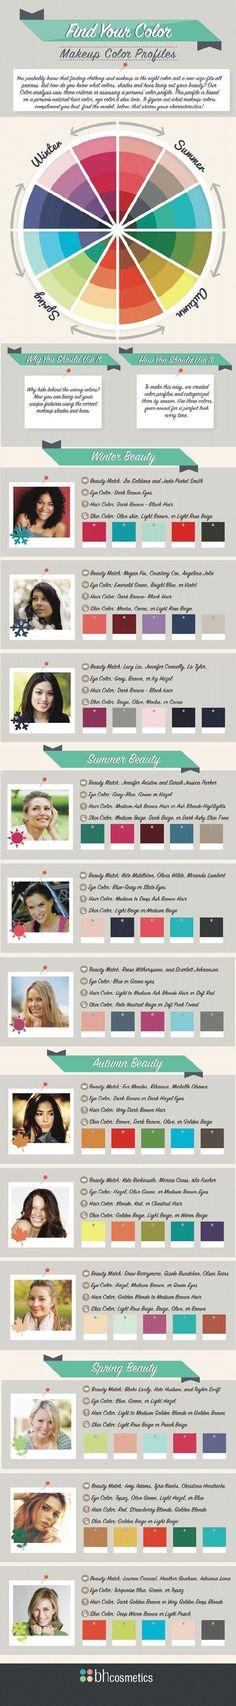 Makeup Tutorials for a Natural Look | Beauty Tips by Makeup Tutorials at http://makeuptutorials.com/makeup-tutorials-beauty-tips